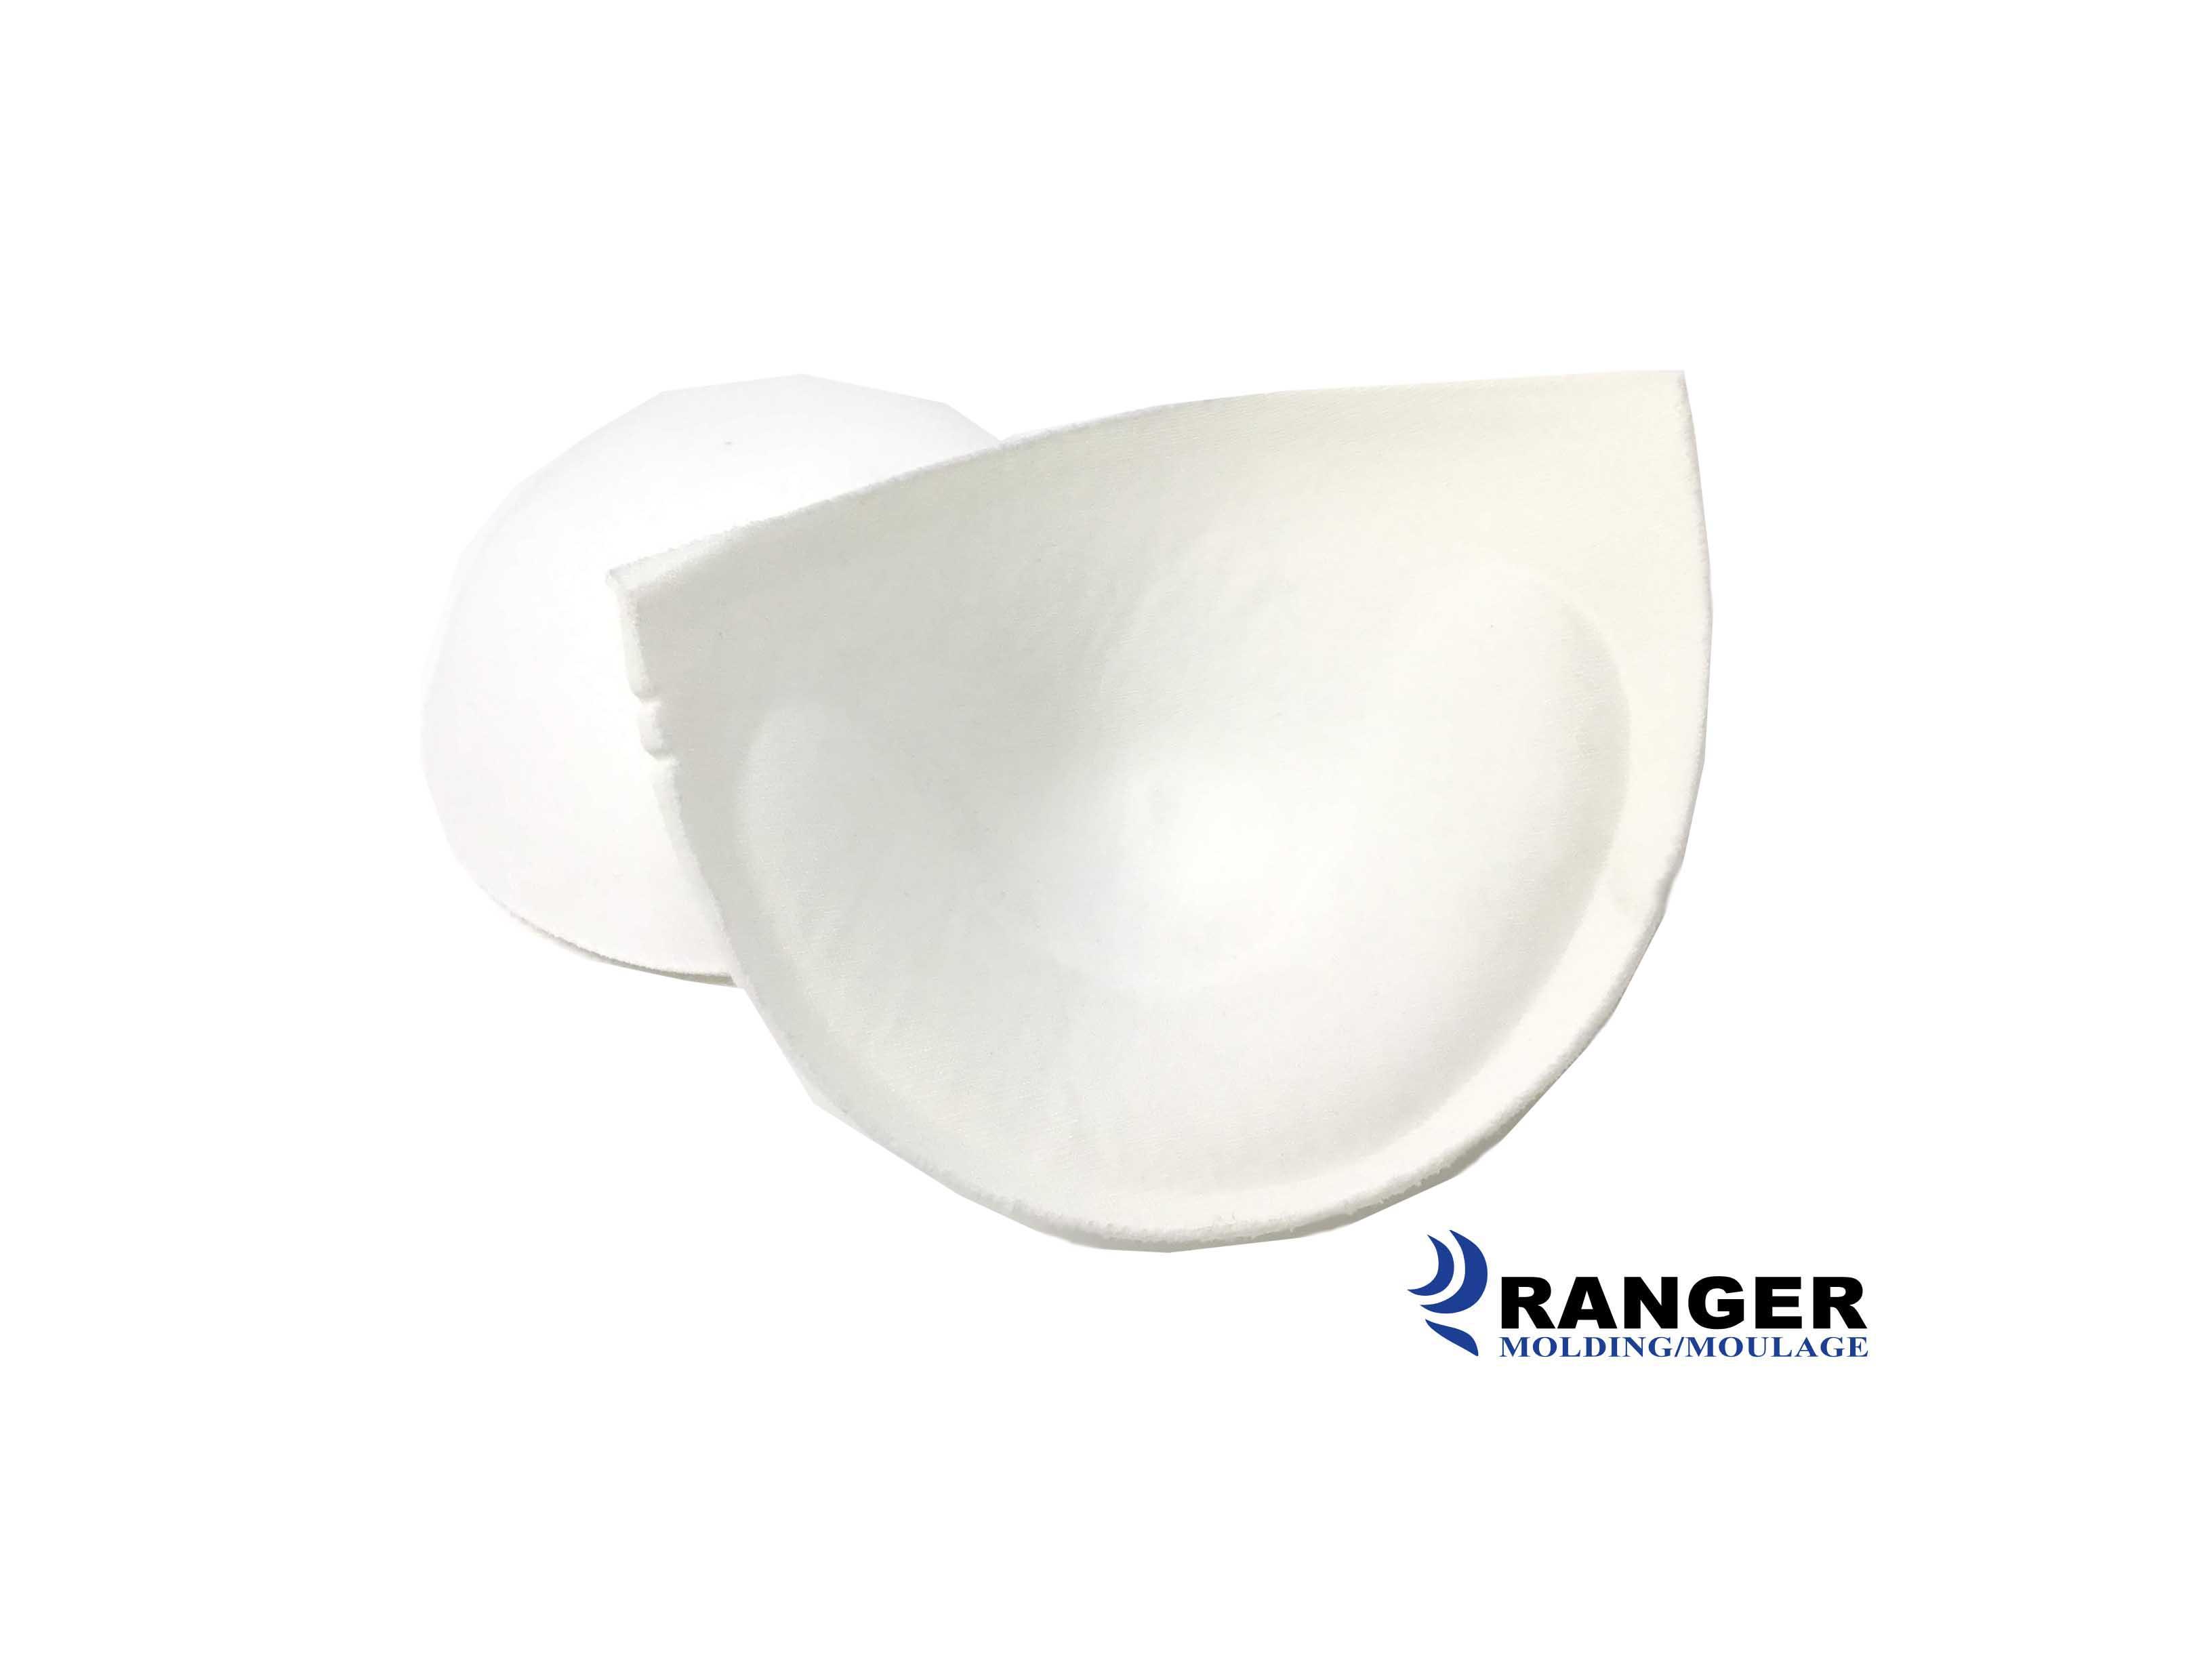 Push up foam cup - 2240 - Ranger Molding (6)